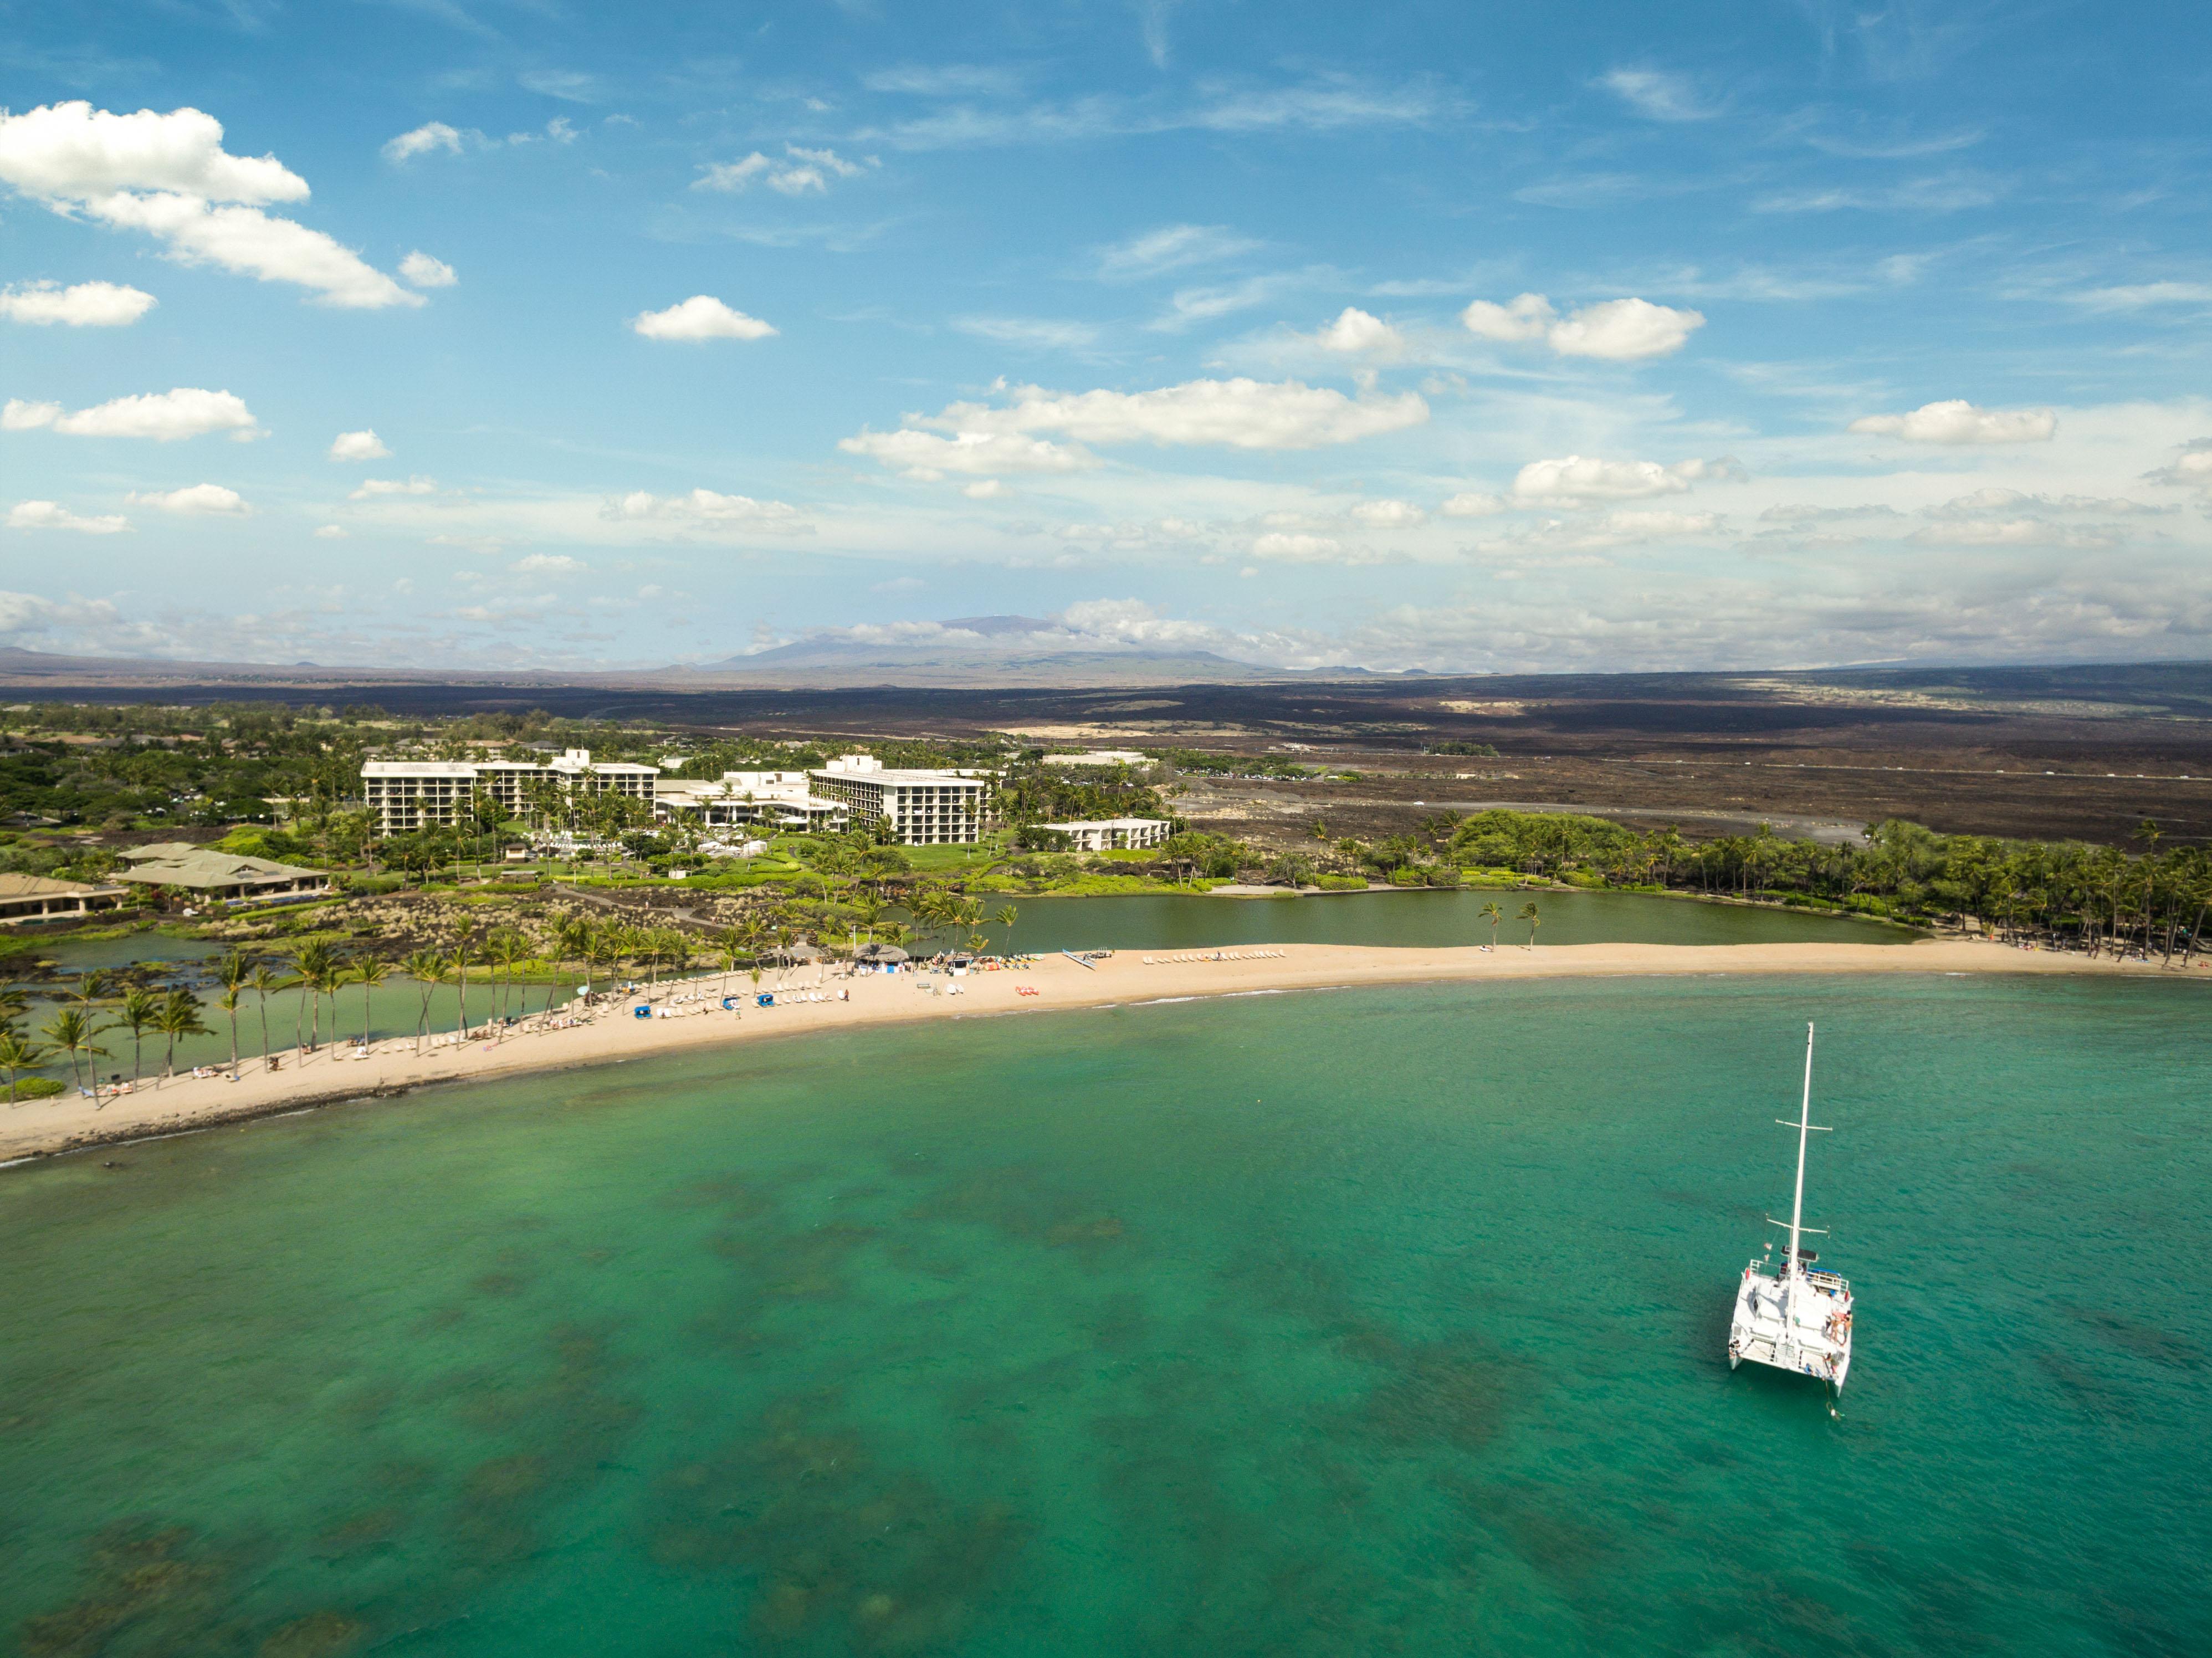 Marriott's Waikoloa Ocean Club Aerial Resort View. Marriott's Waikoloa Ocean Club is located in Waikoloa Beach, Big Island, Hawai'i United States.